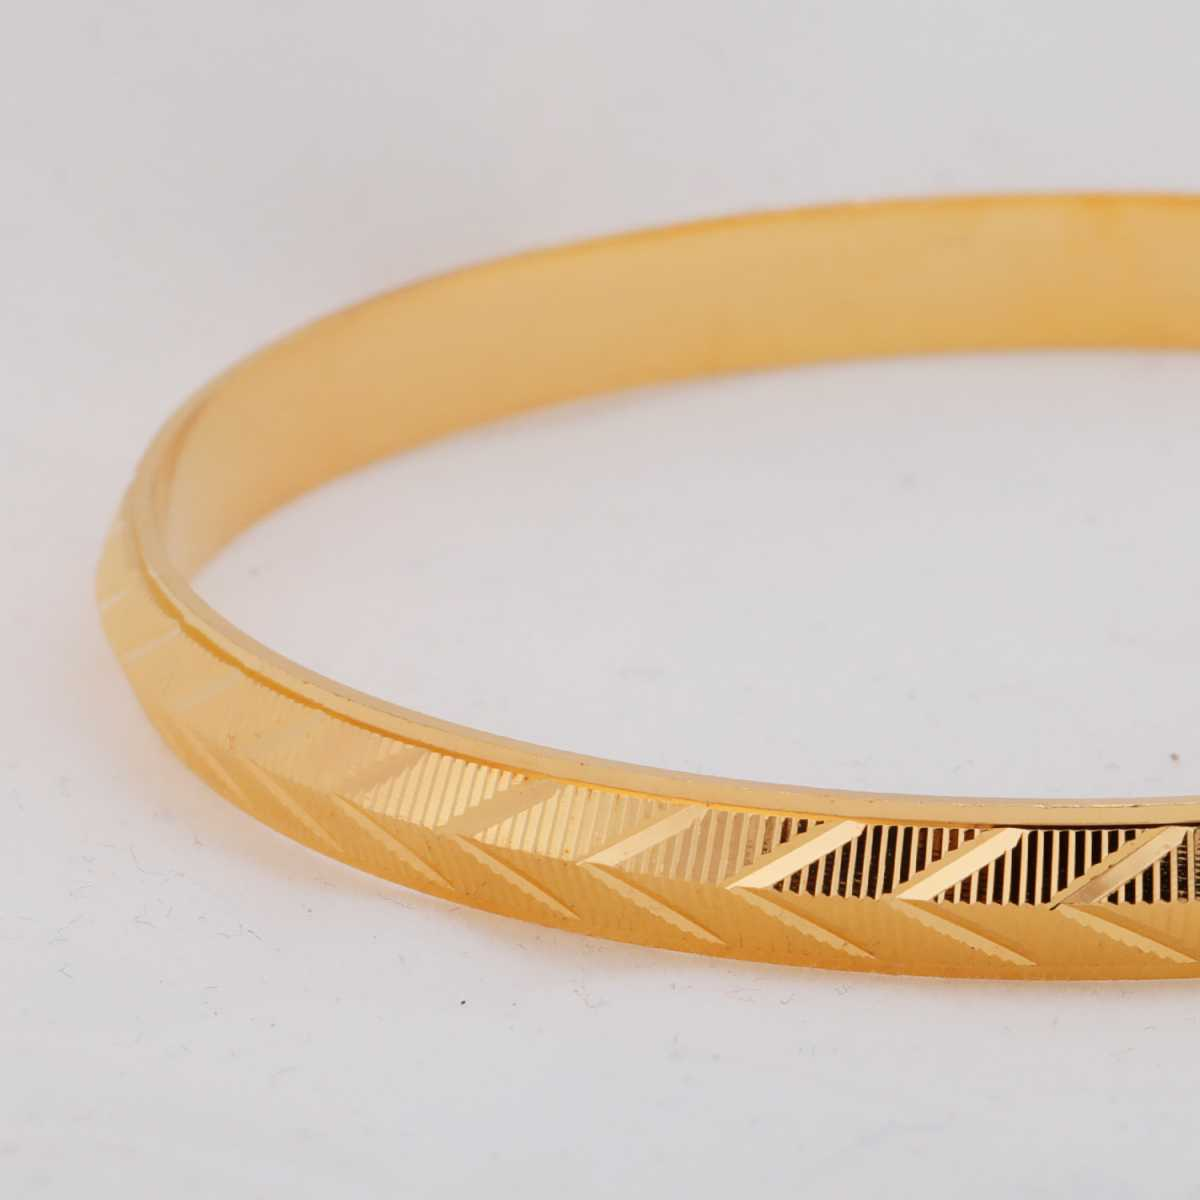 Silver Shine Gold Plated Metal Cross Design Punjabi Kada Bangle Bracelet For Boys and Mens.